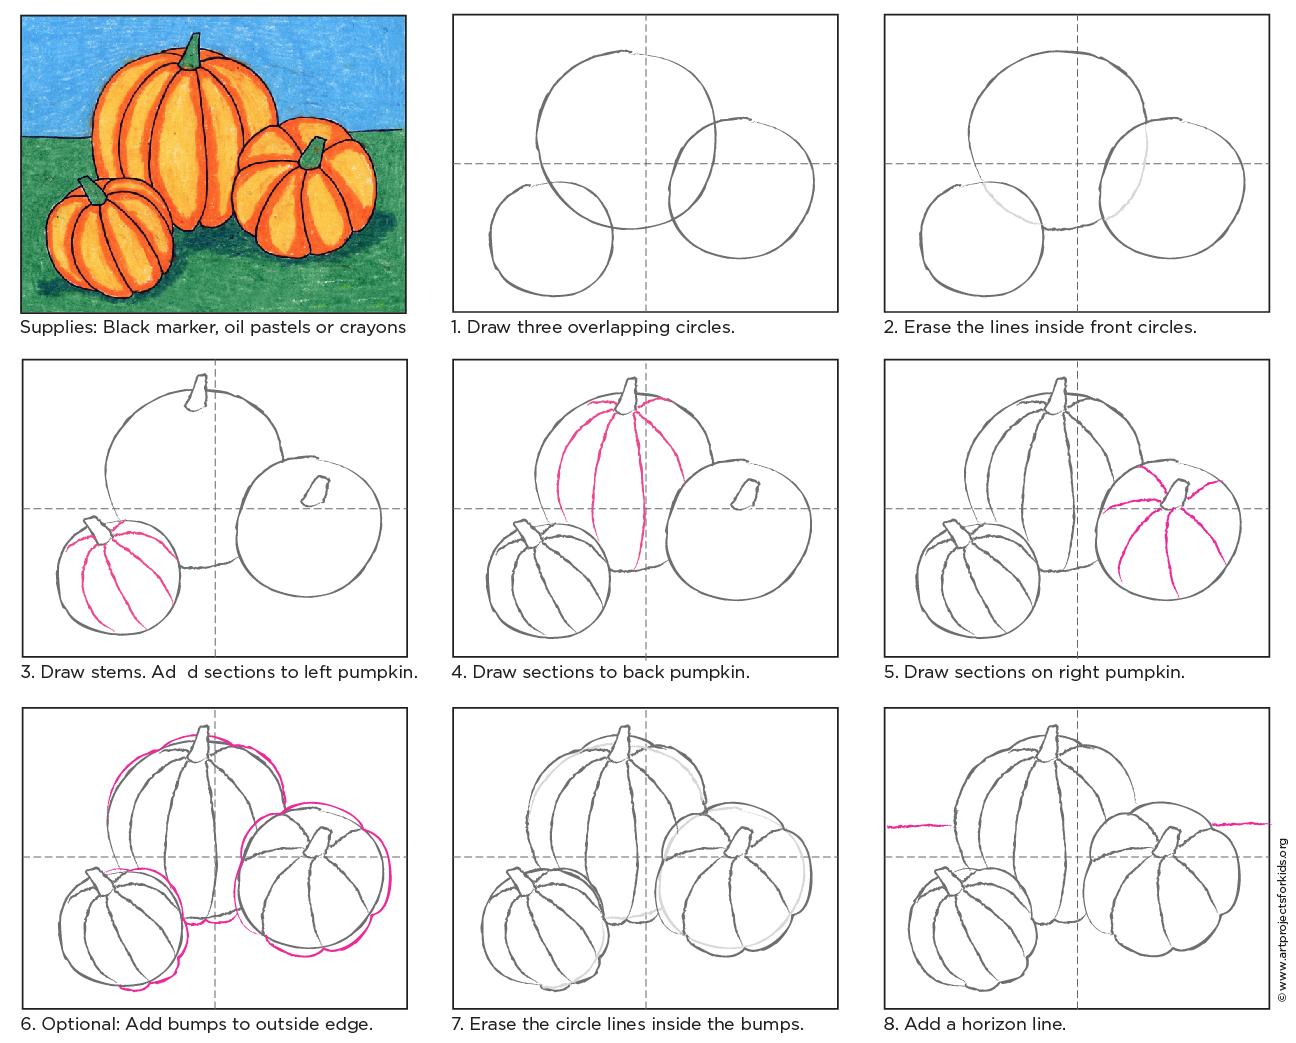 Pumpkin Drawing Art Projects For Kids